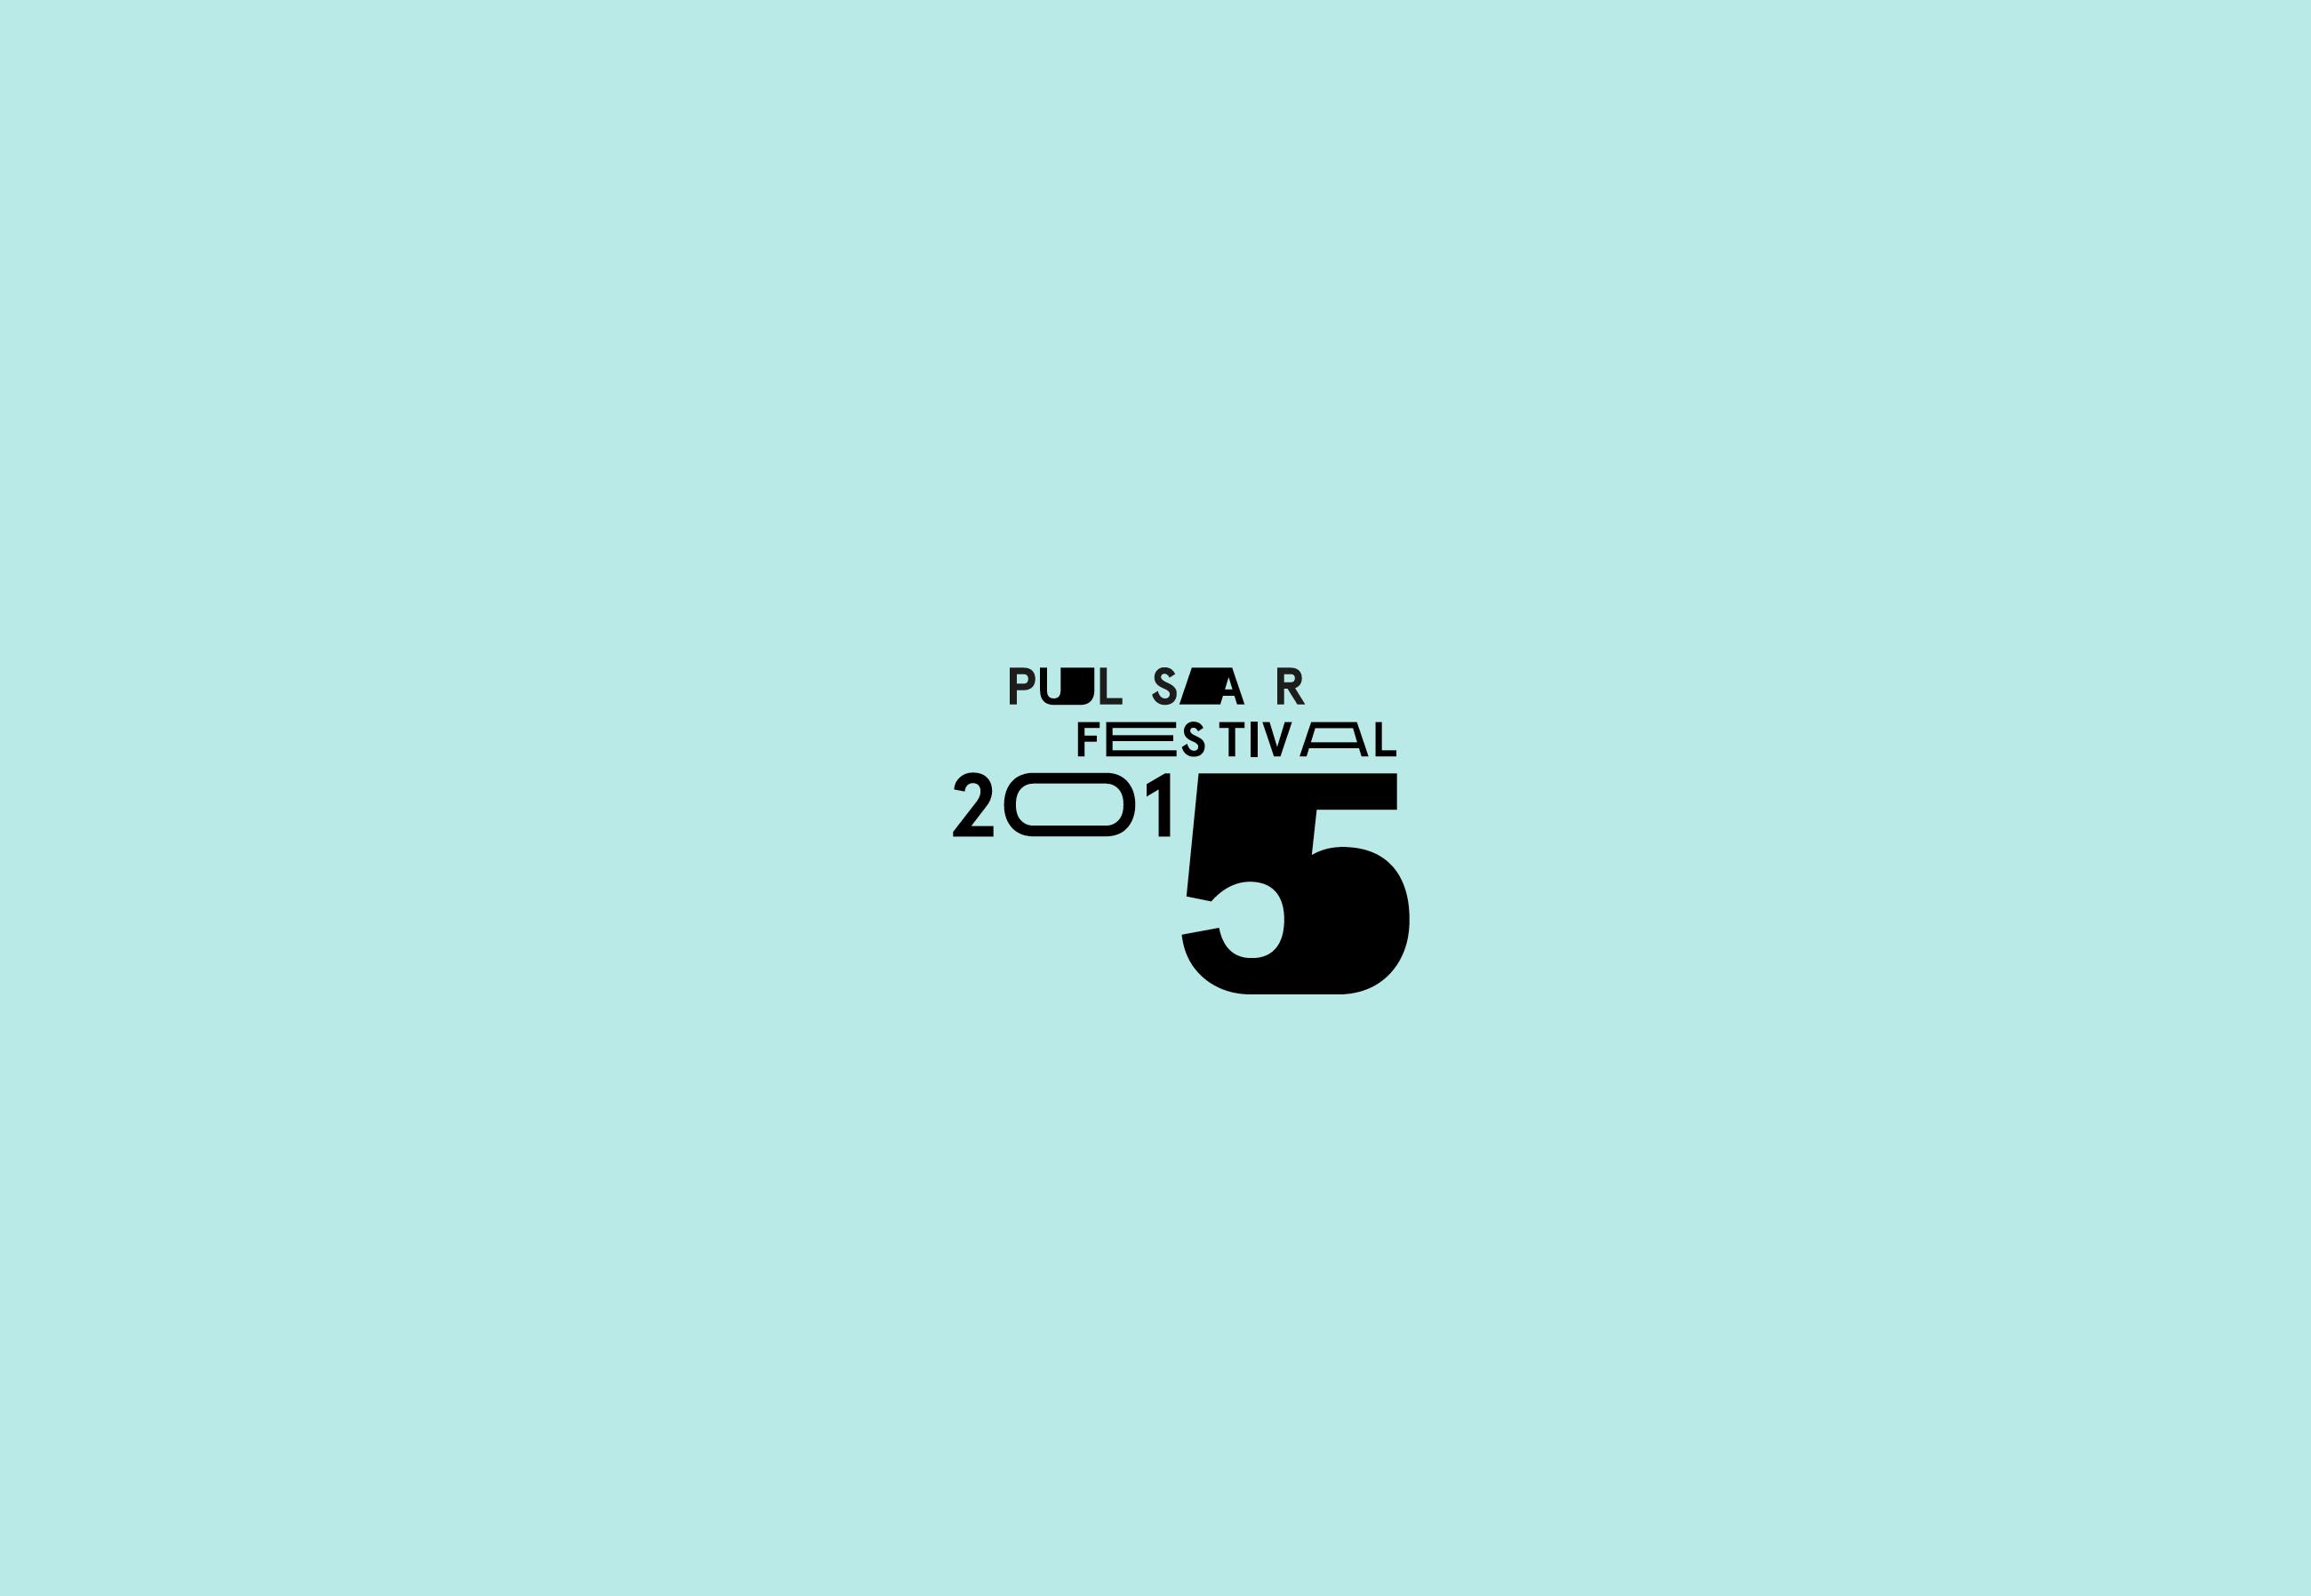 pulsar_philipjohansen_logo